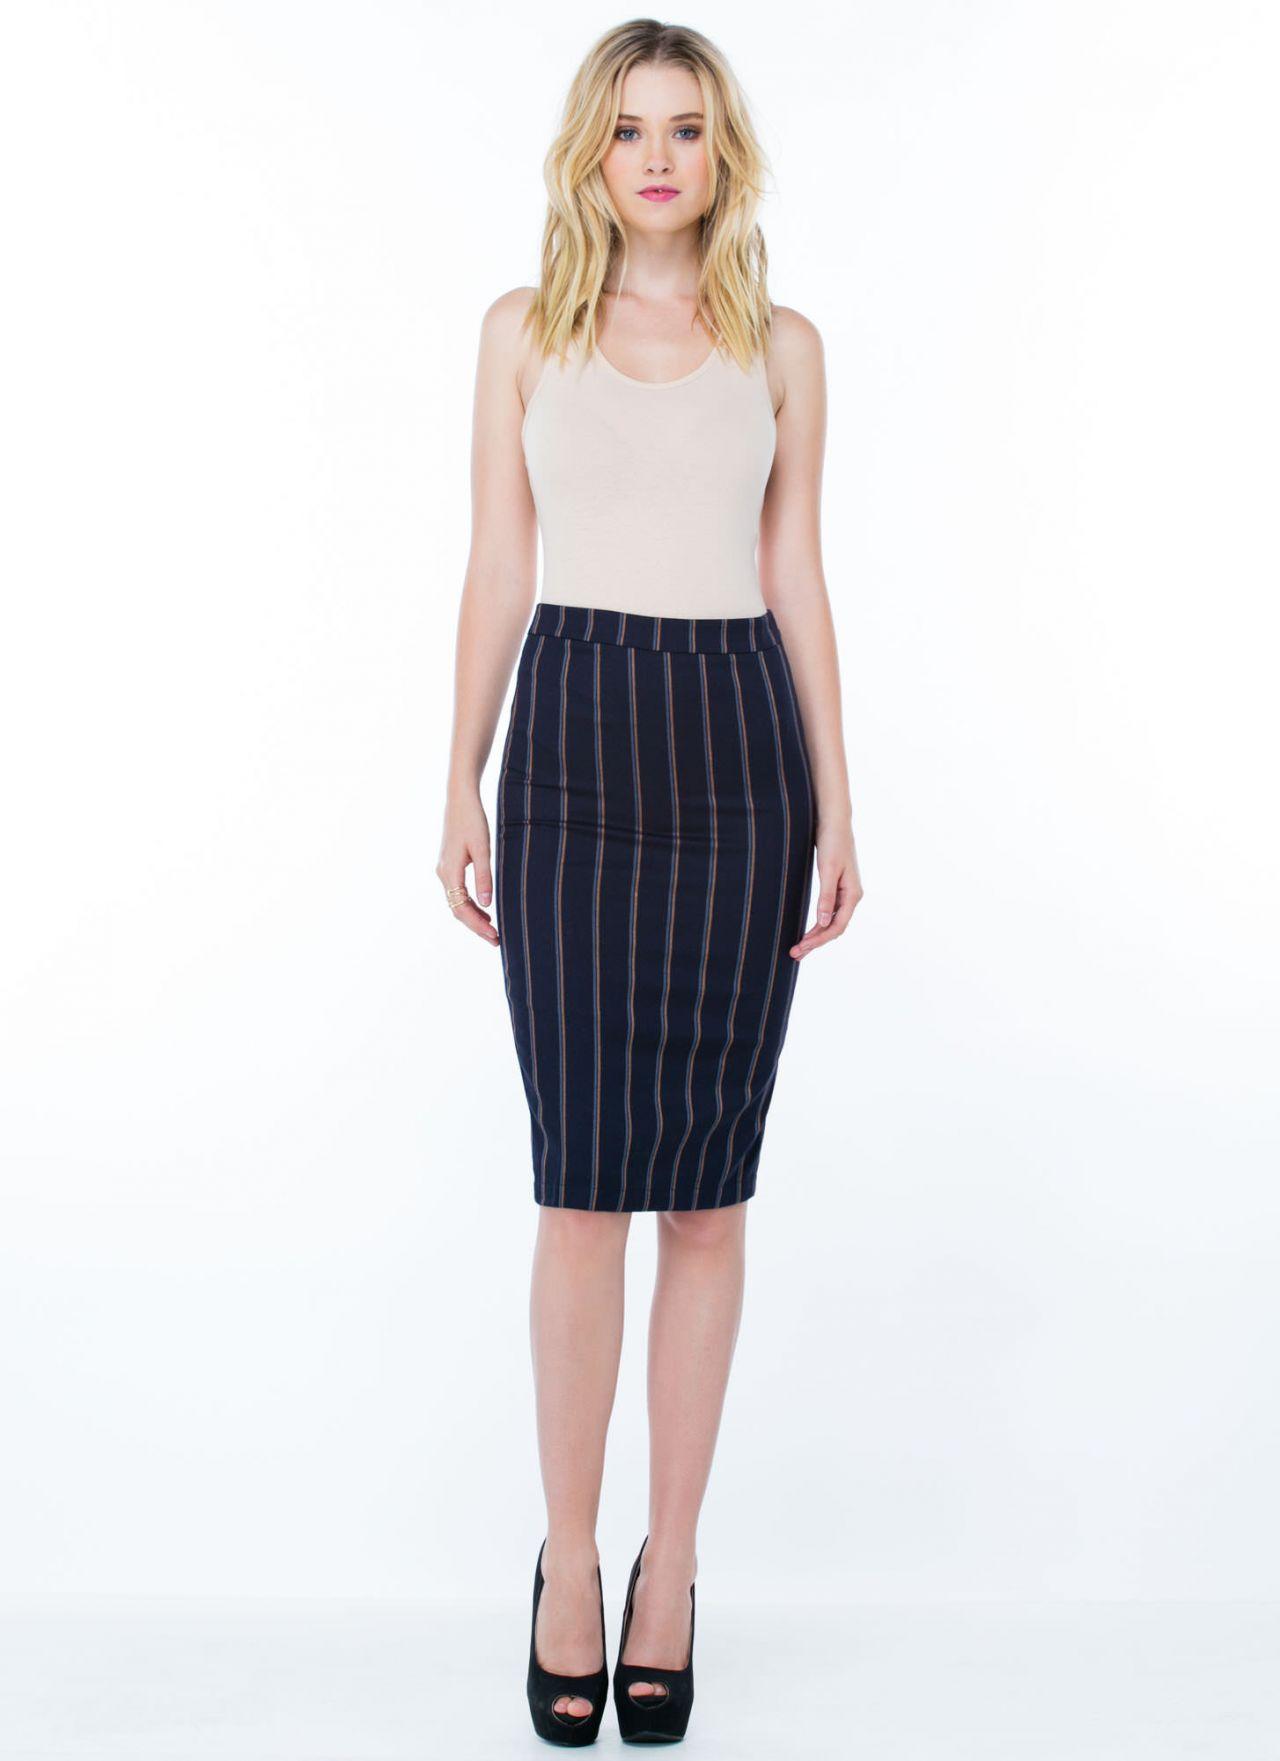 Gardner – GoJane Fashion, October 2014